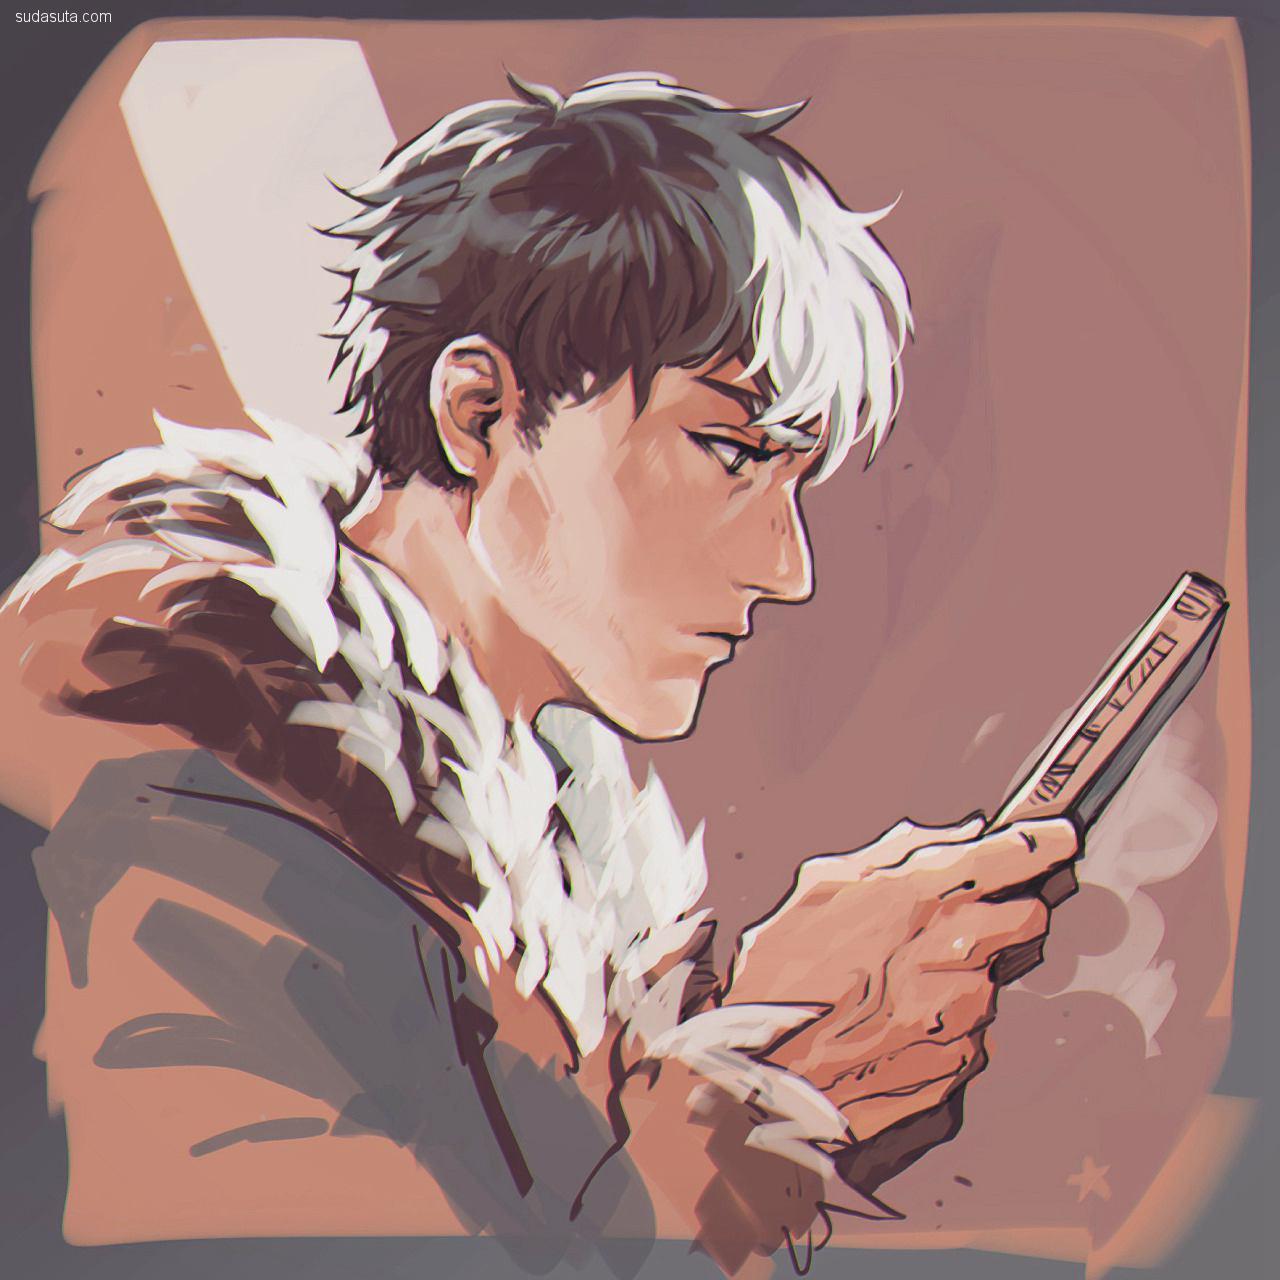 Hosino Hikaru 二次元手绘漫画欣赏